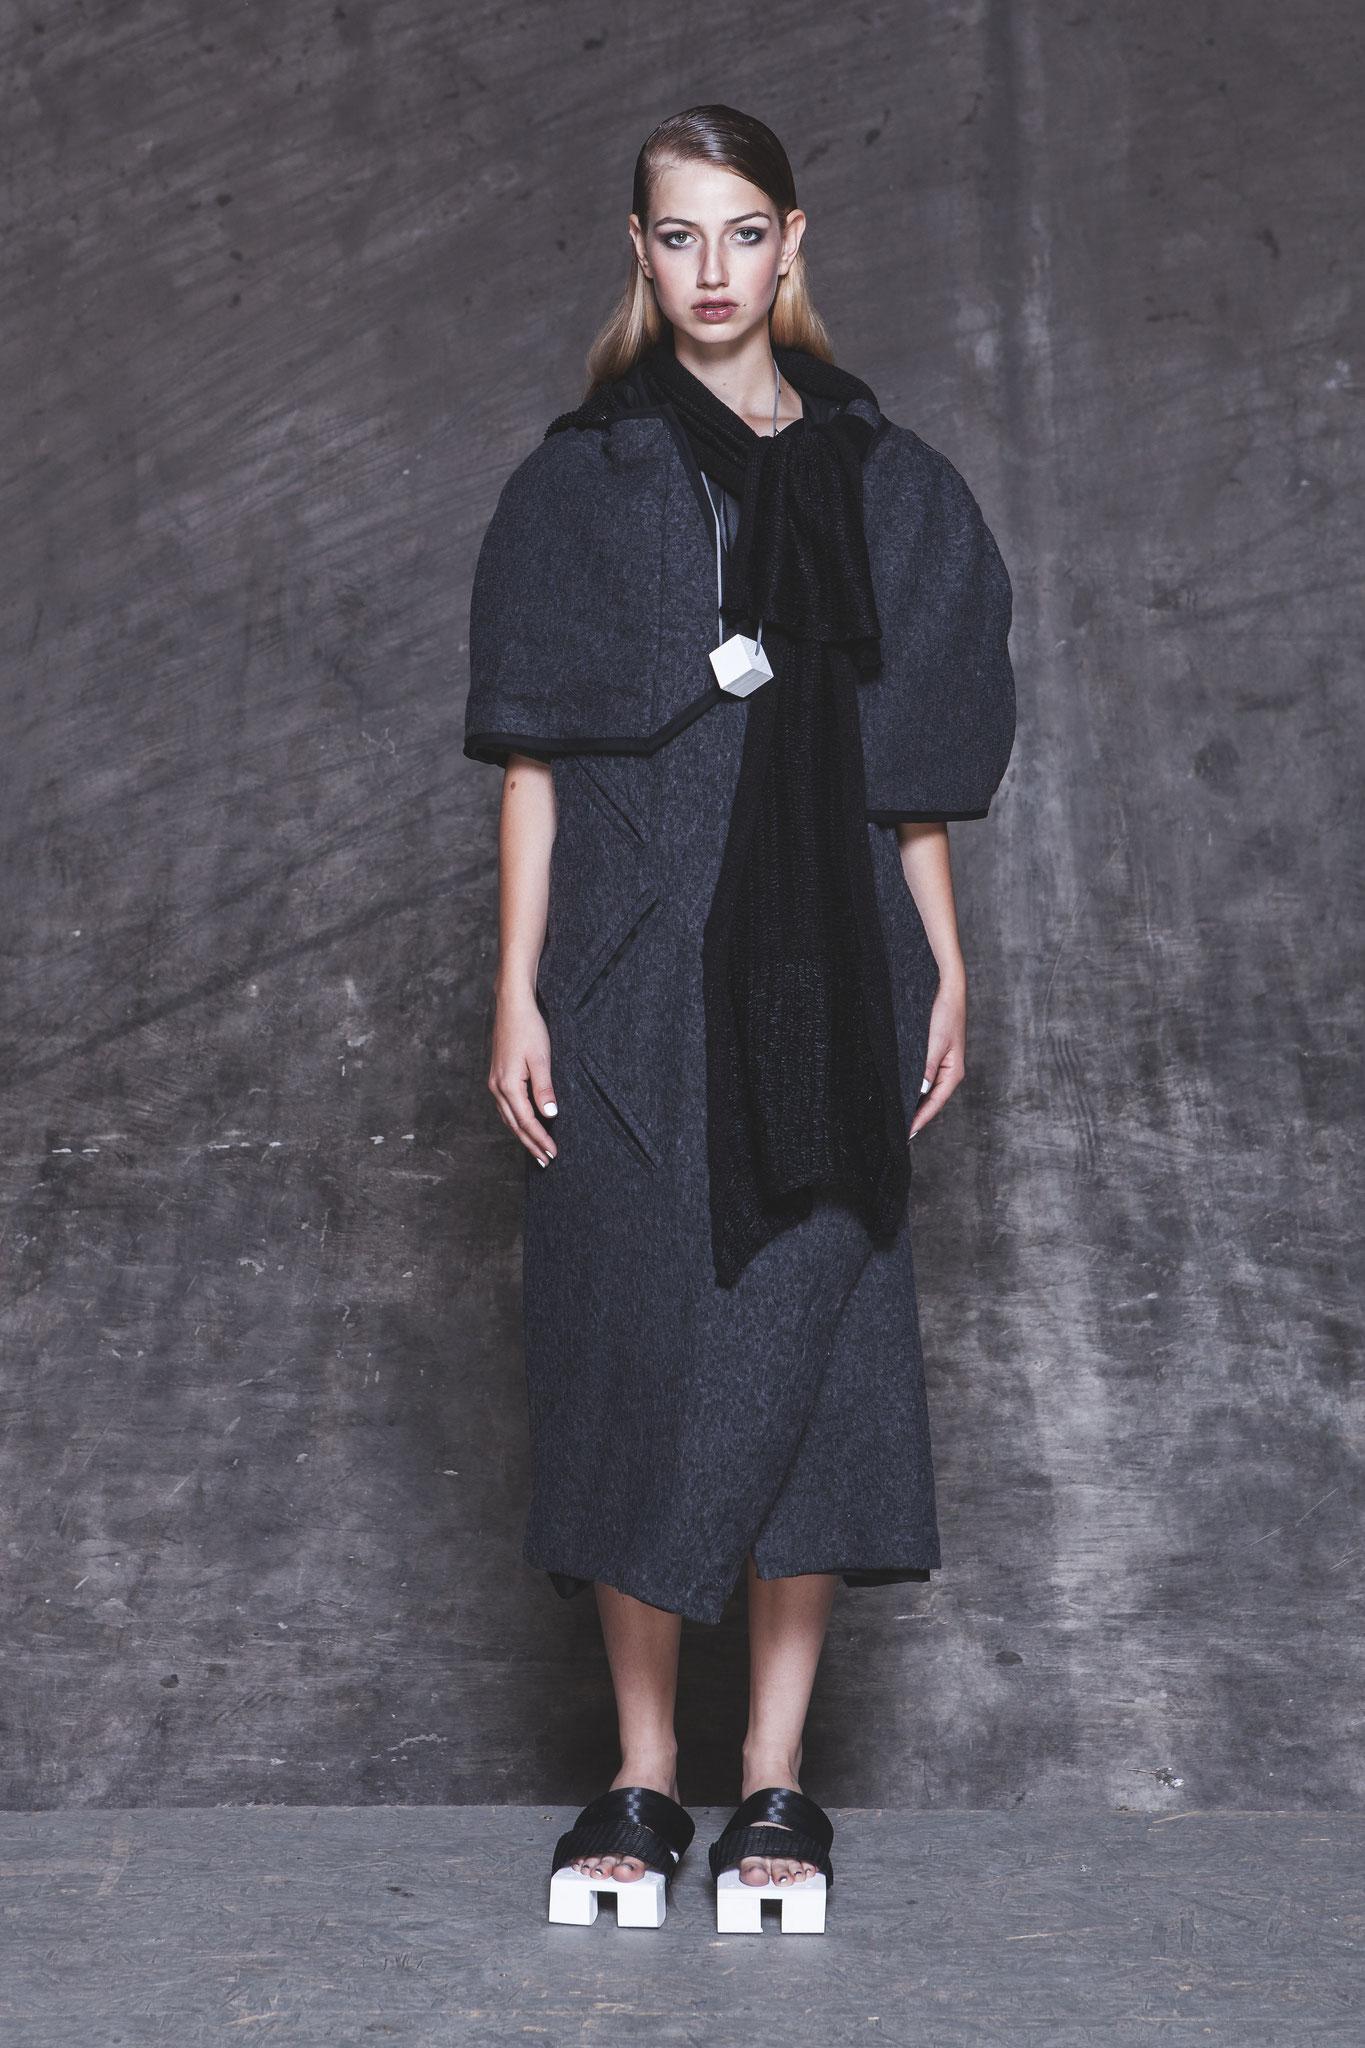 Model // Hannah Peschanel